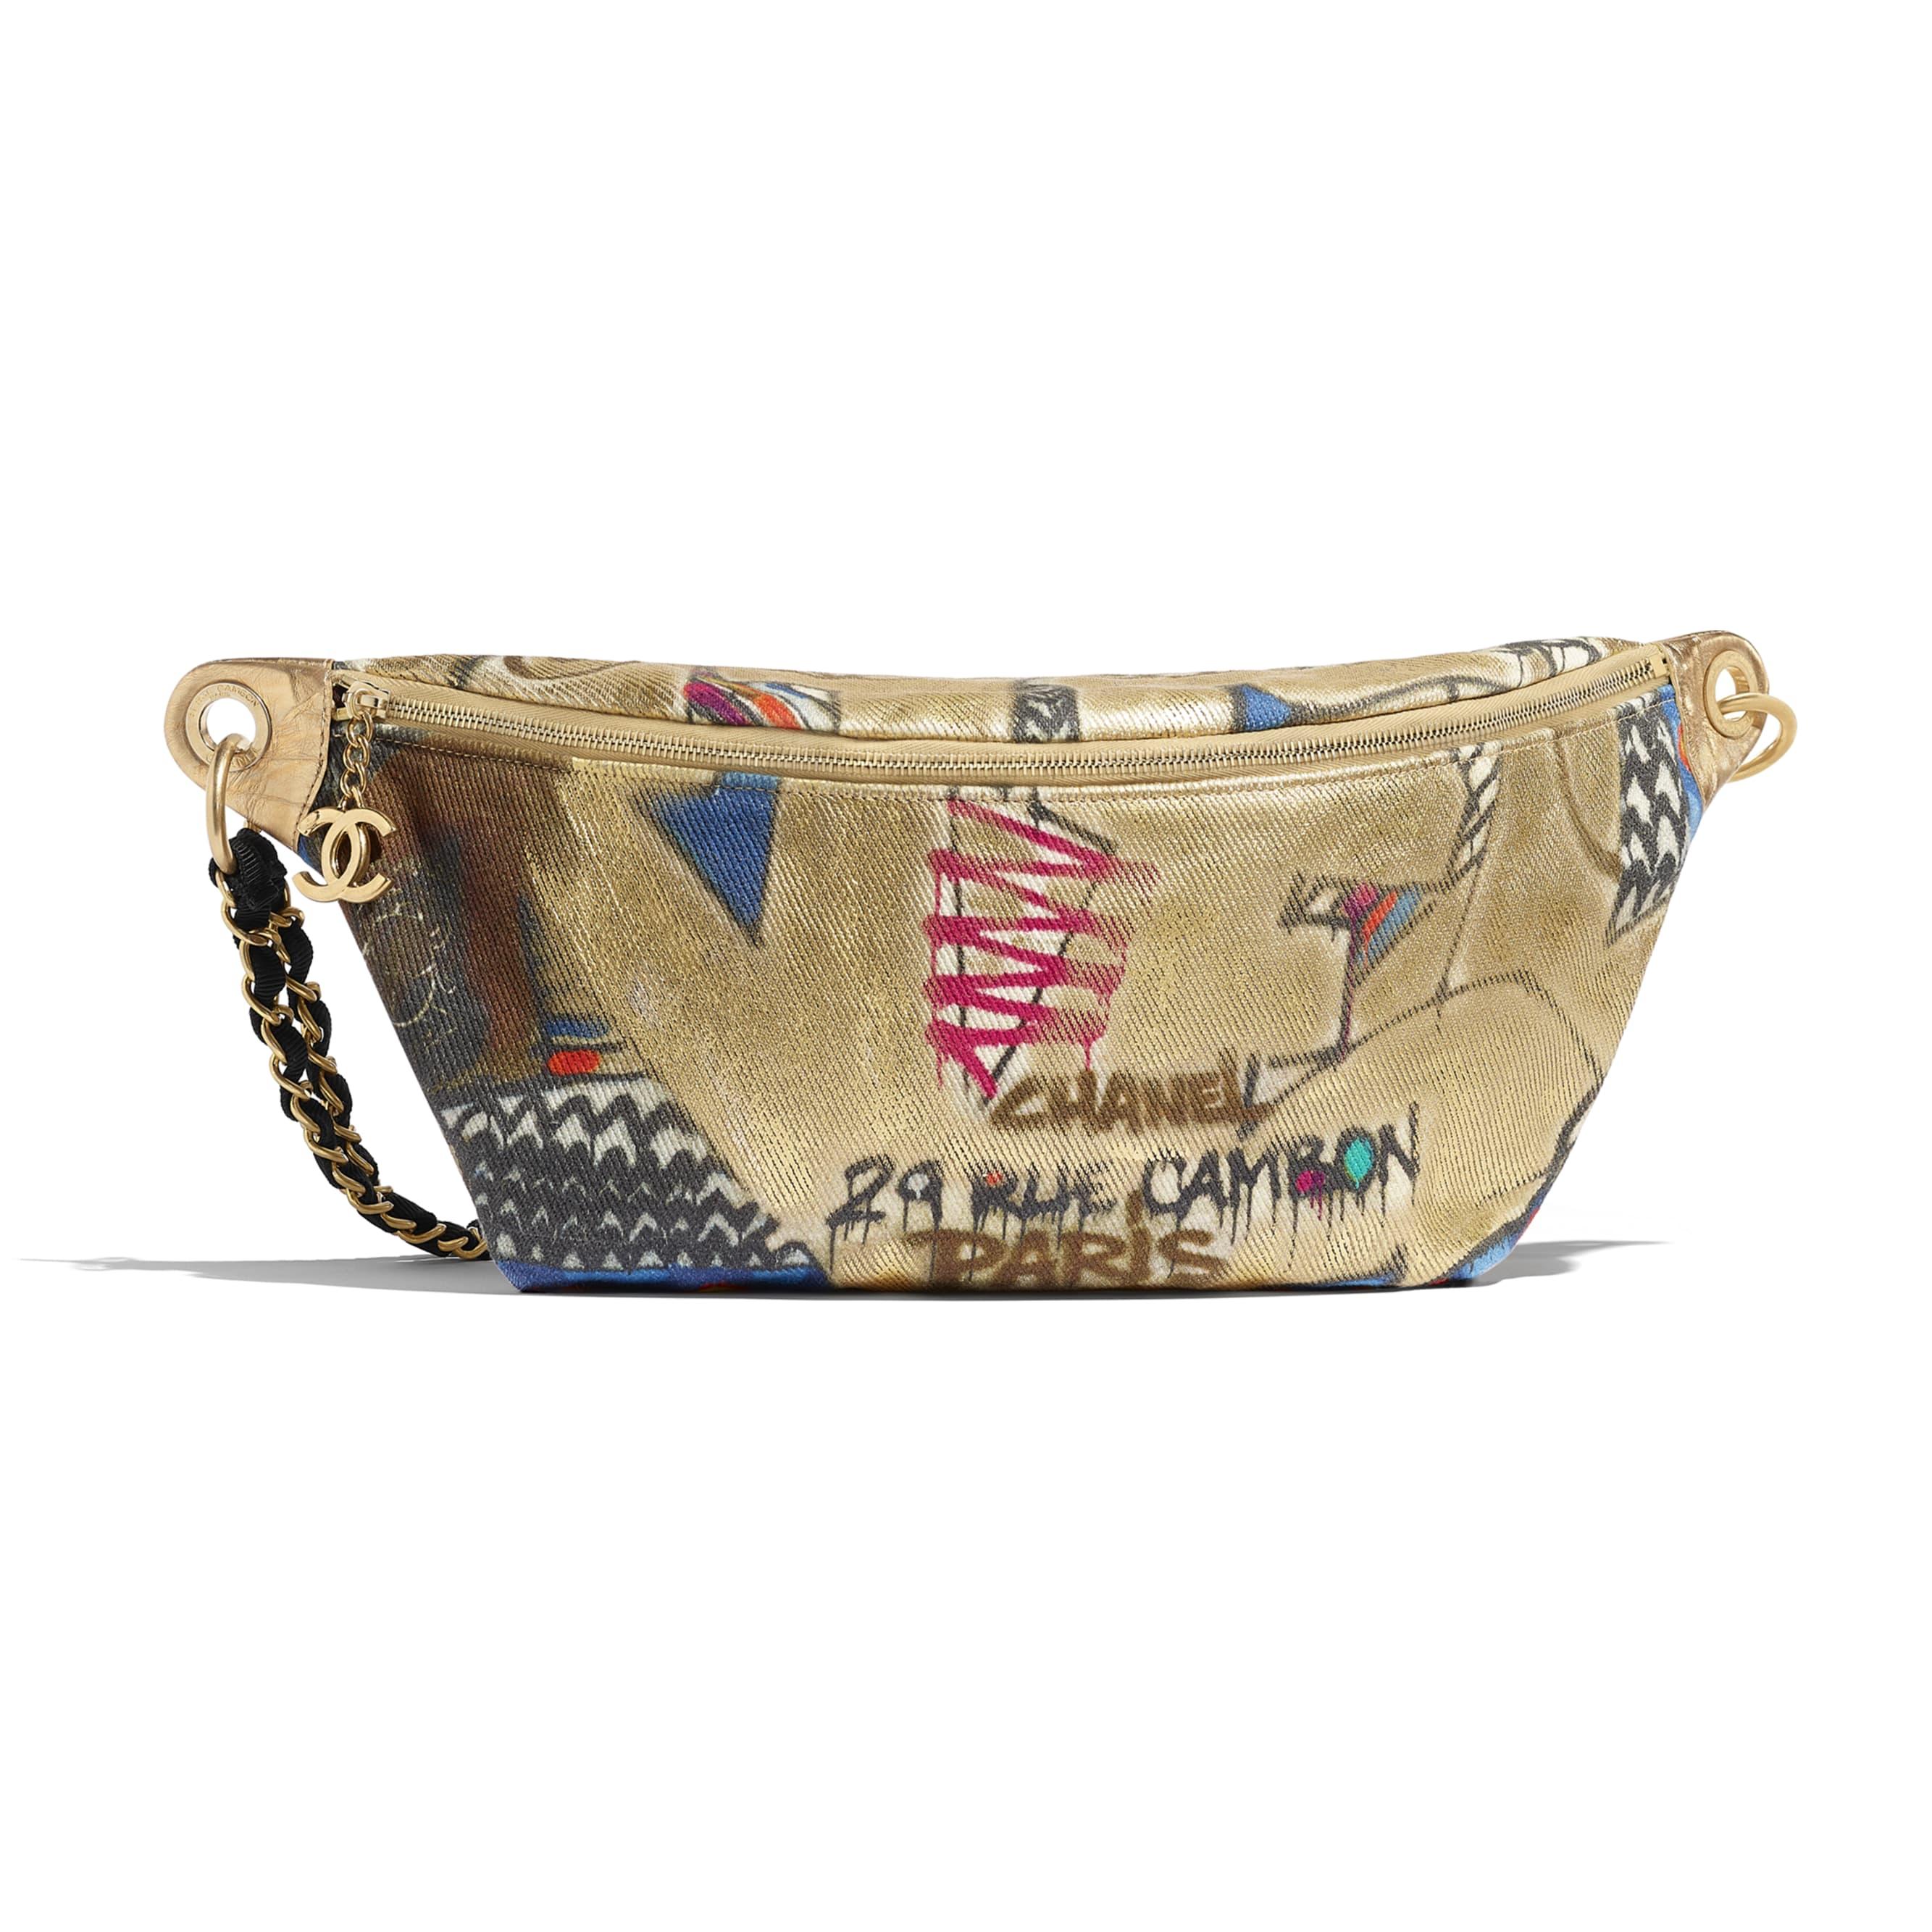 Waist Bag - Multicolor - Calfskin, Cotton & Gold-Tone Metal - Default view - see standard sized version